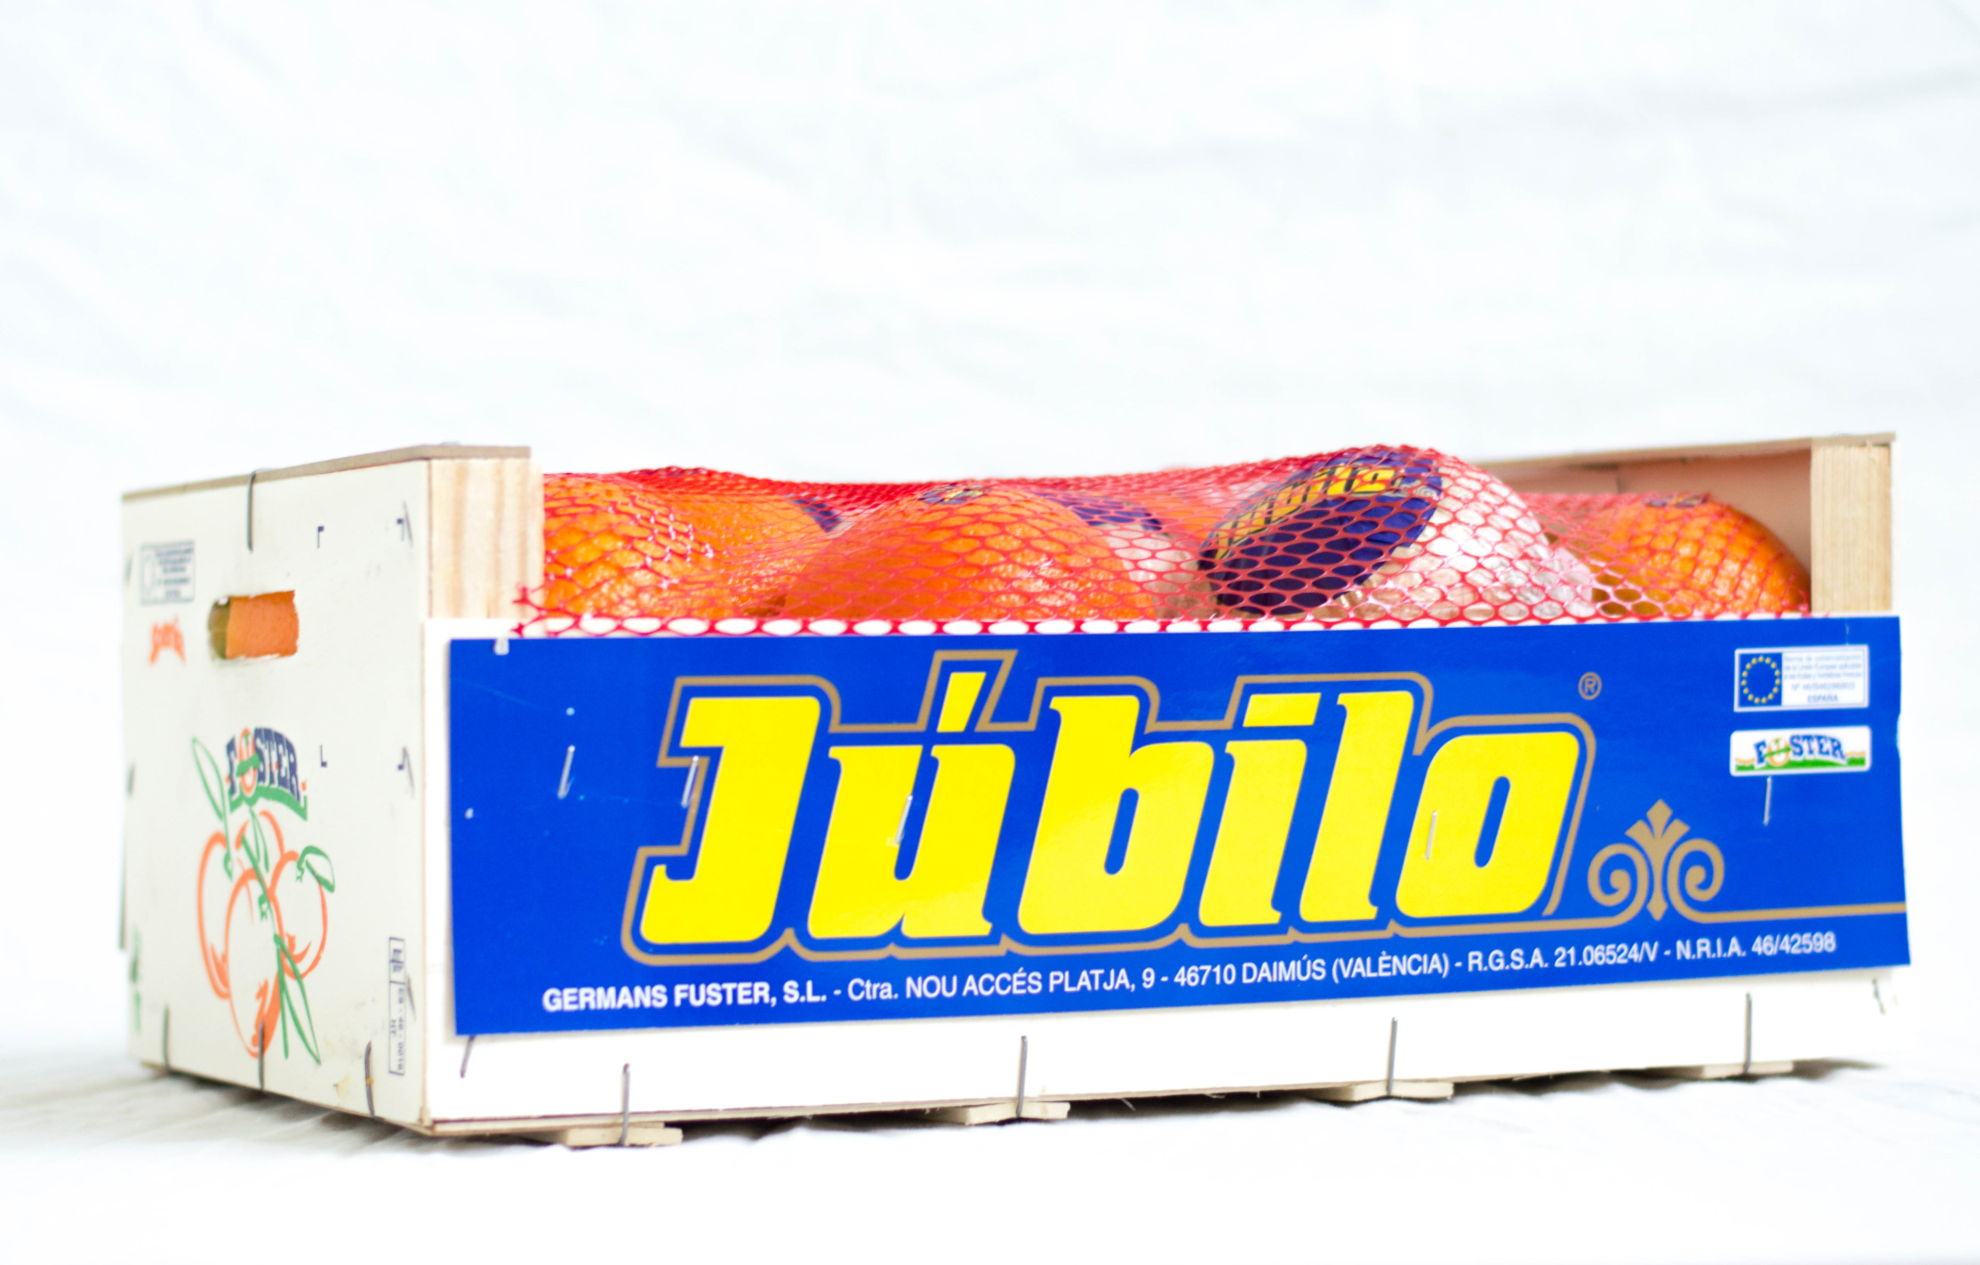 jubilo-germansfuster